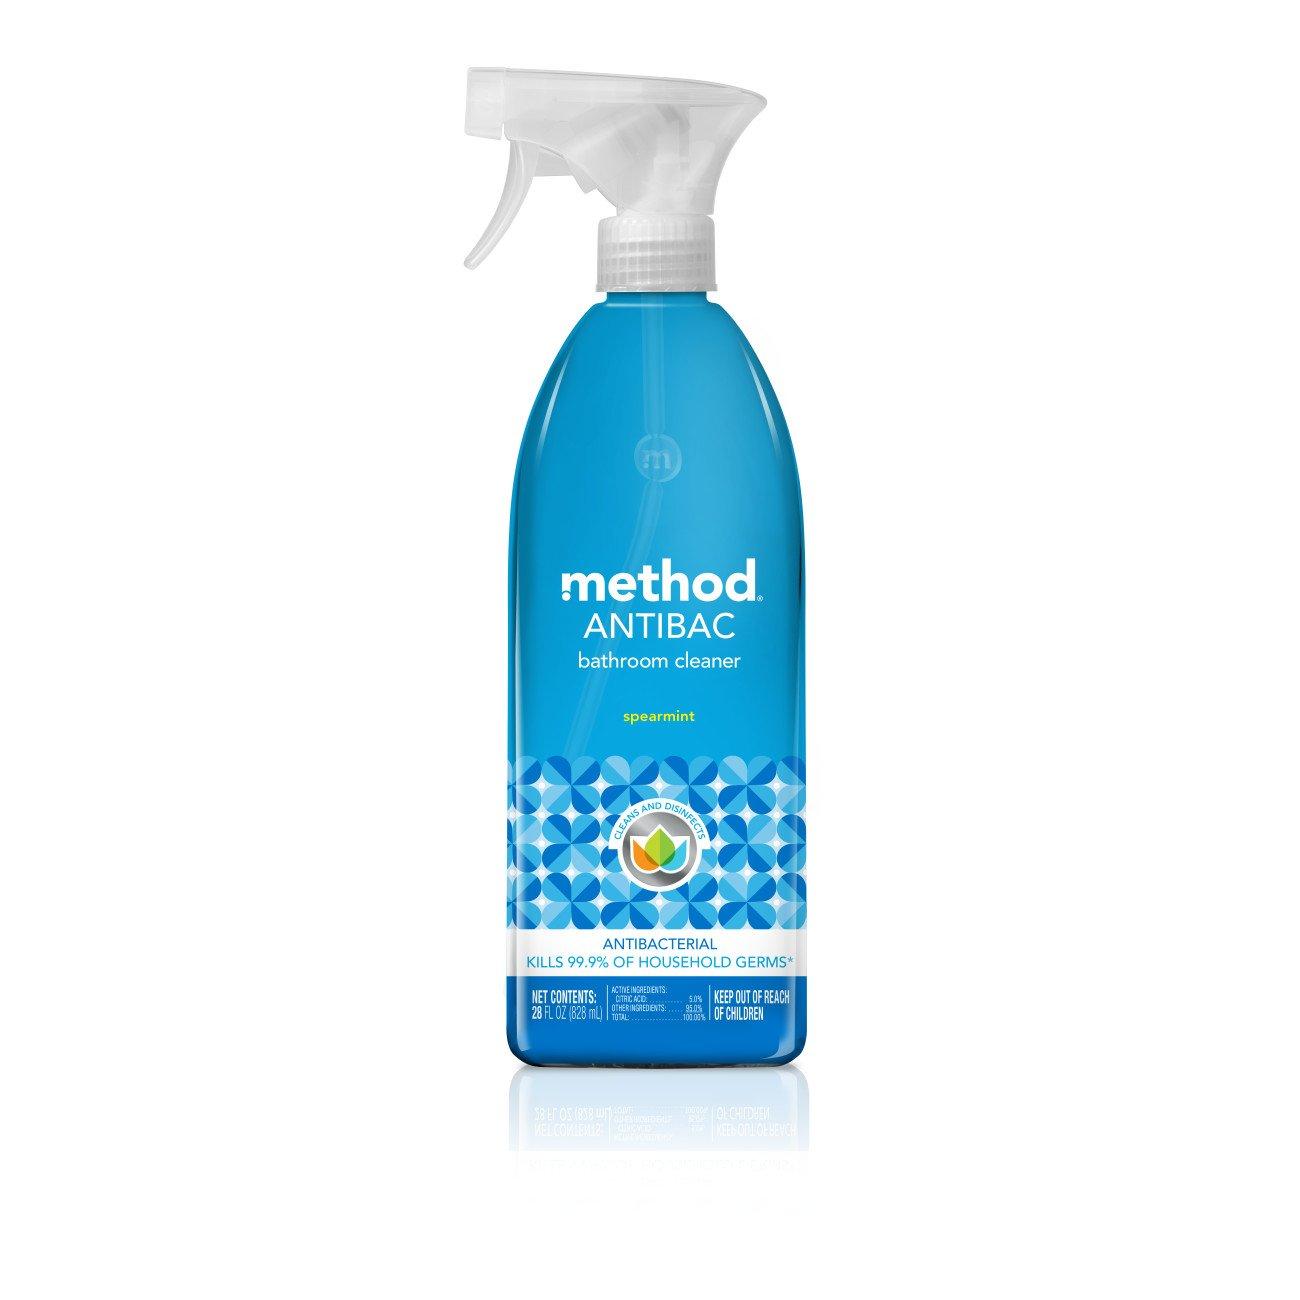 Amazoncom Method Antibacterial Bathroom Cleaner Spearmint - Bathroom cleanser